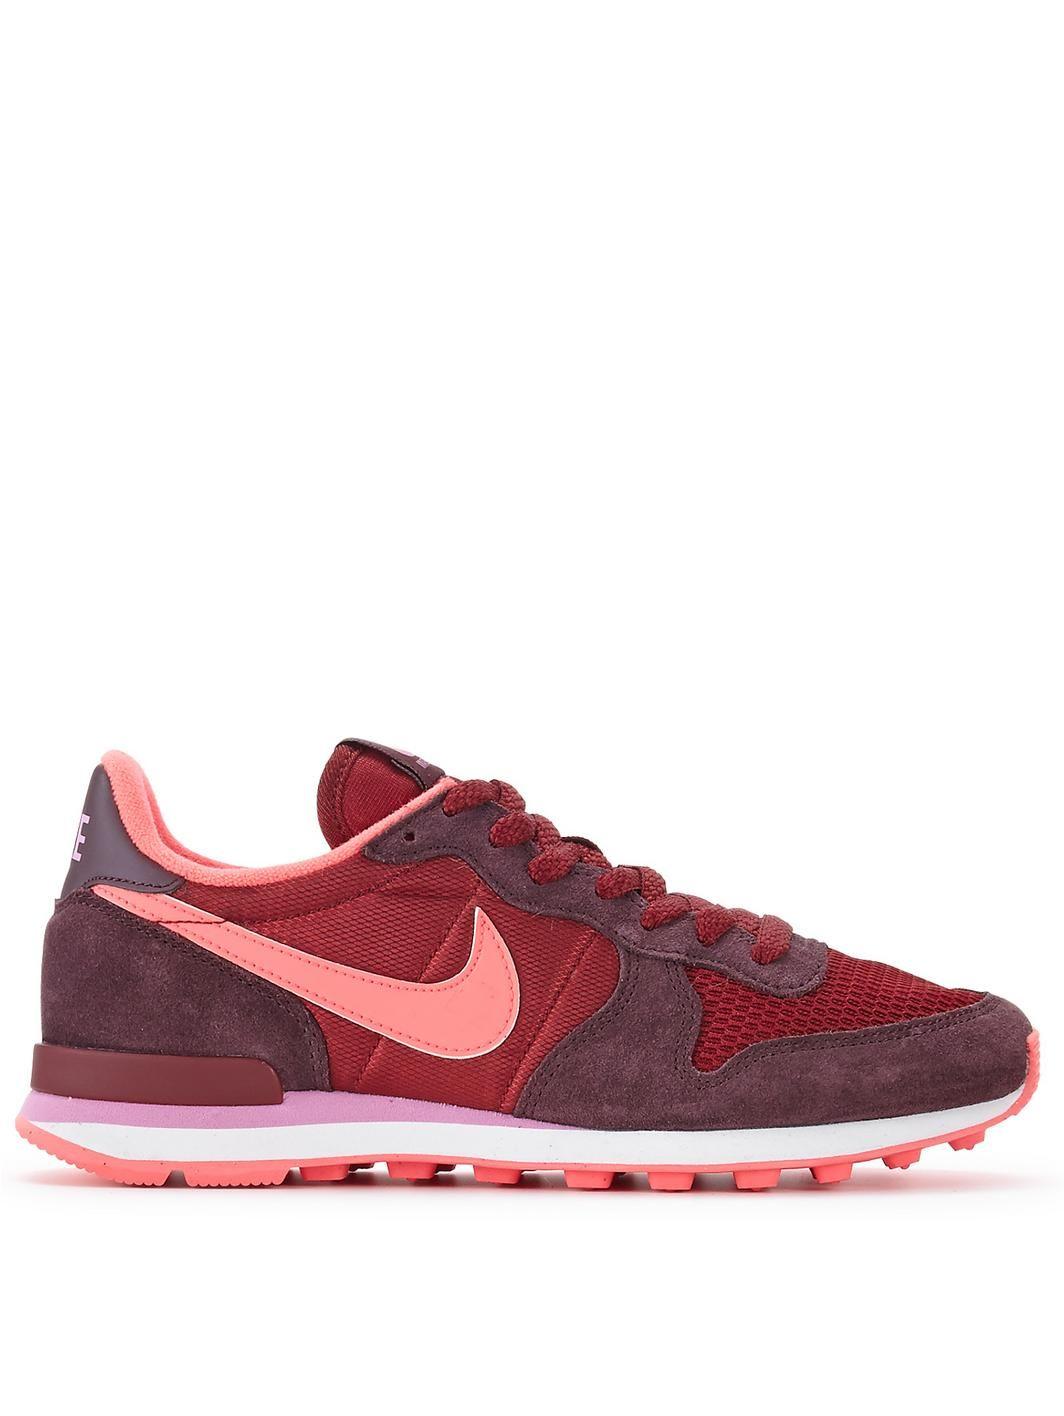 Nike Internationalist Trainers - Womens Trainers - COLOUR-burgundy/orange